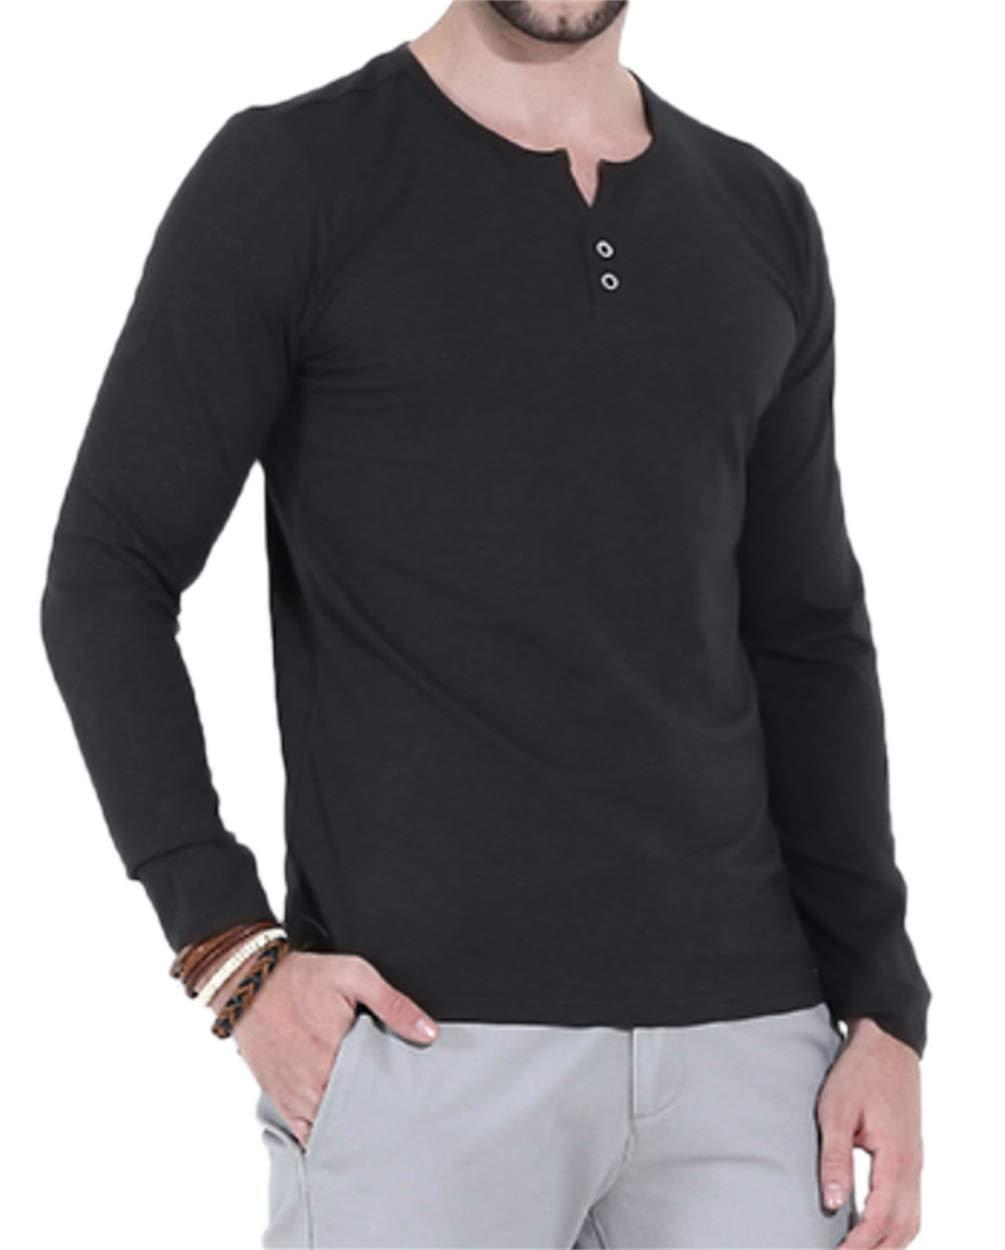 Aiyino Mens Casual Slim Fit Long Sleeve Henley T-Shirts Cotton Shirts US M-C Black